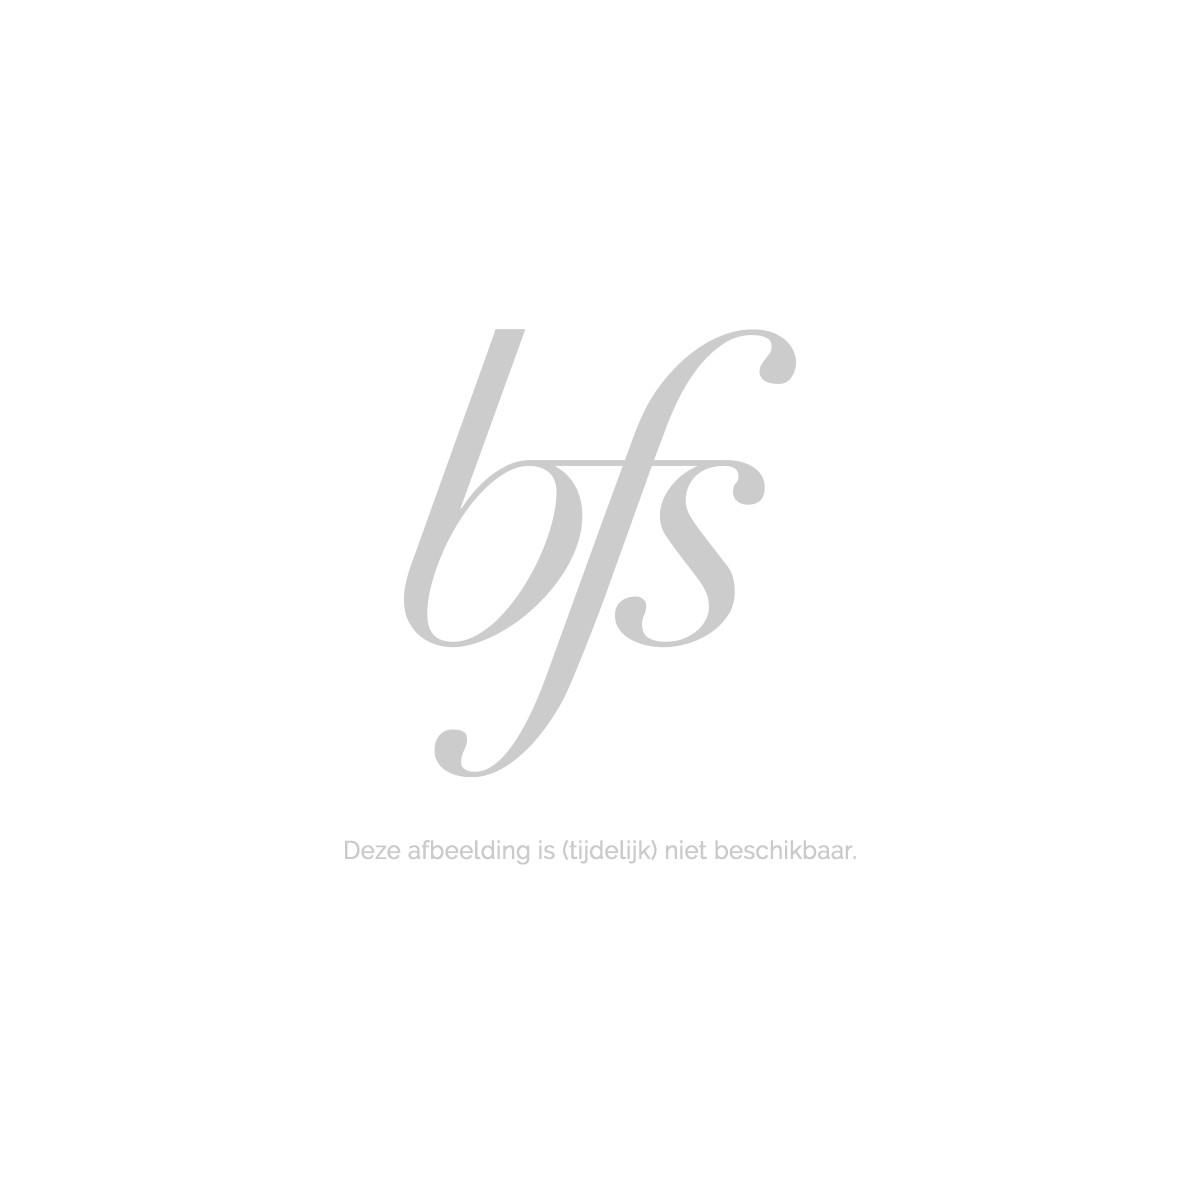 Pupa BB Cream + Primer For Combination To Oily Skin 001 Nude